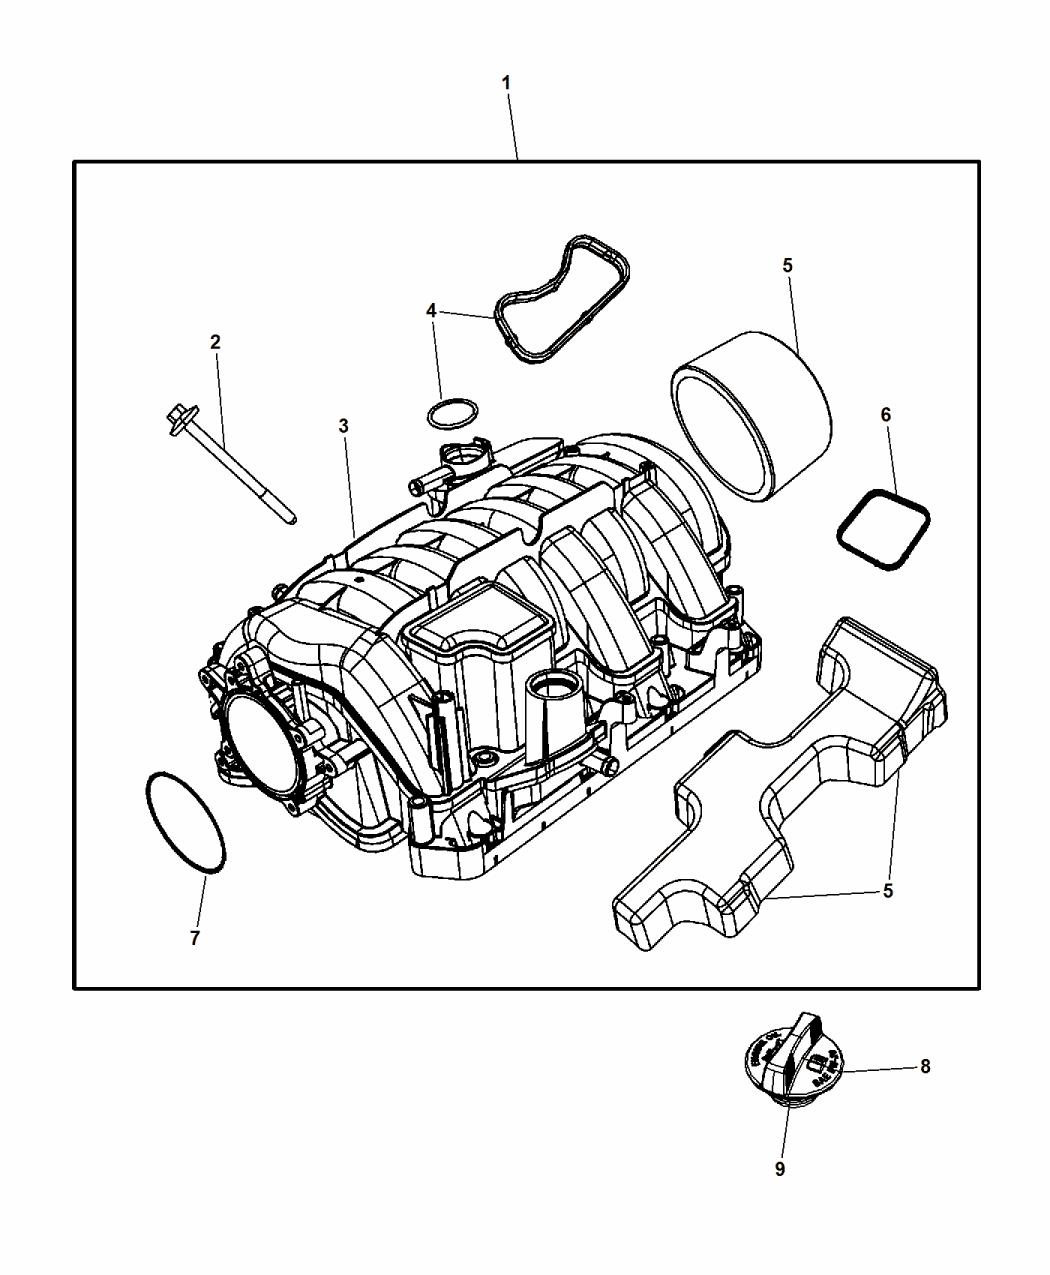 1050x1275 Intake Manifold For 2015 Dodge Challenger Mopar Parts Giant